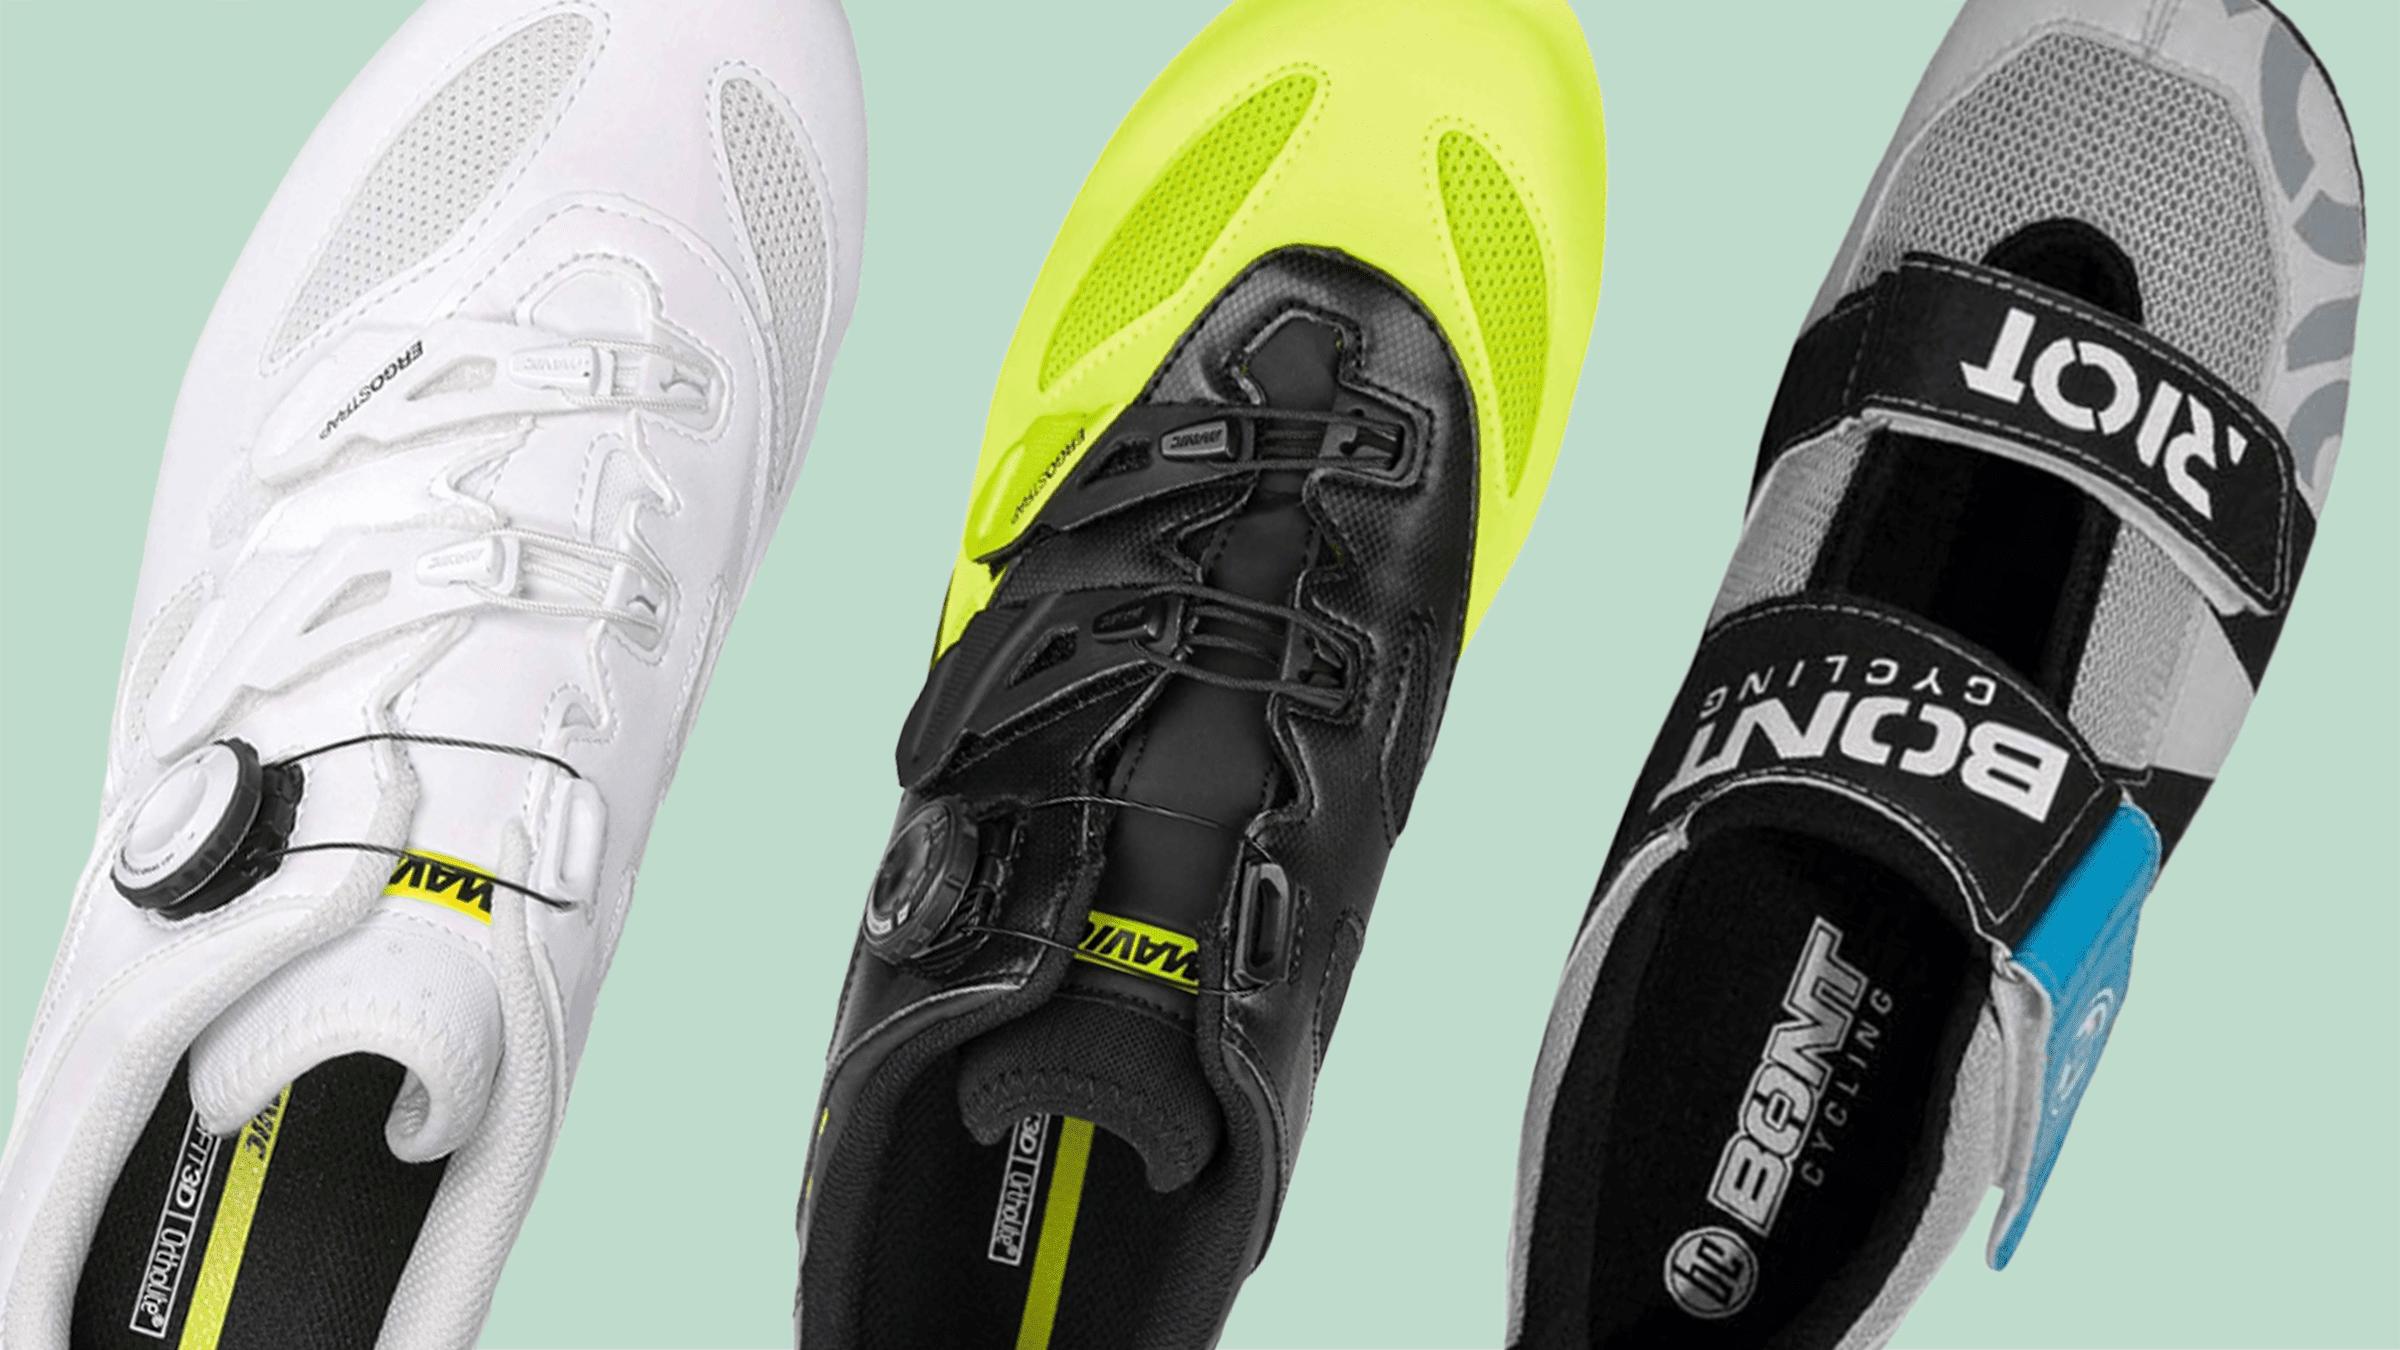 10 Best Triathlon Cycling Shoes in 2021